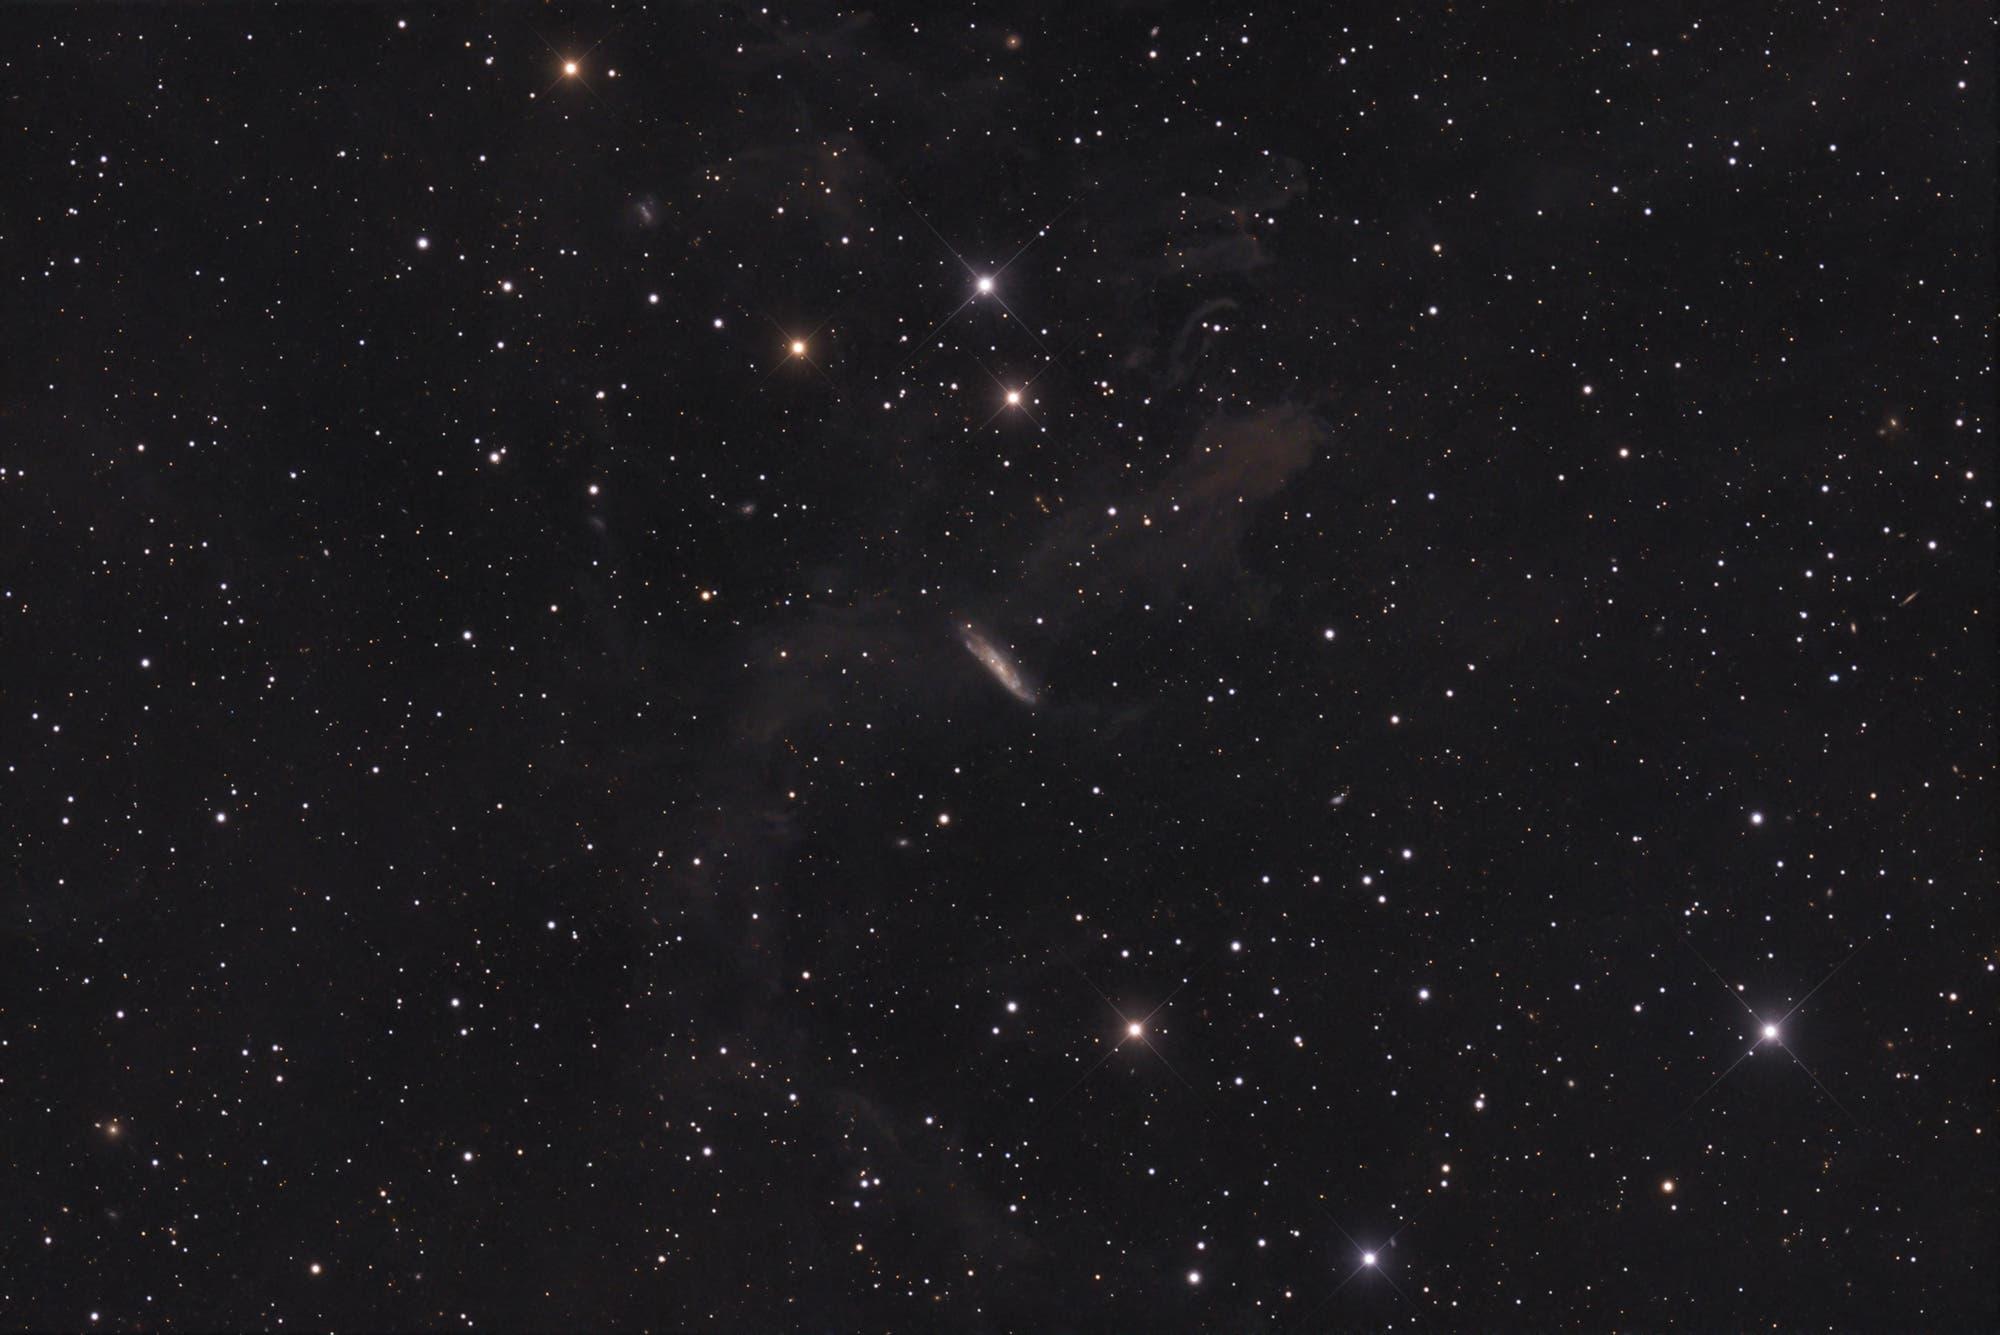 NGC 7597 - Galaxie im Nebel